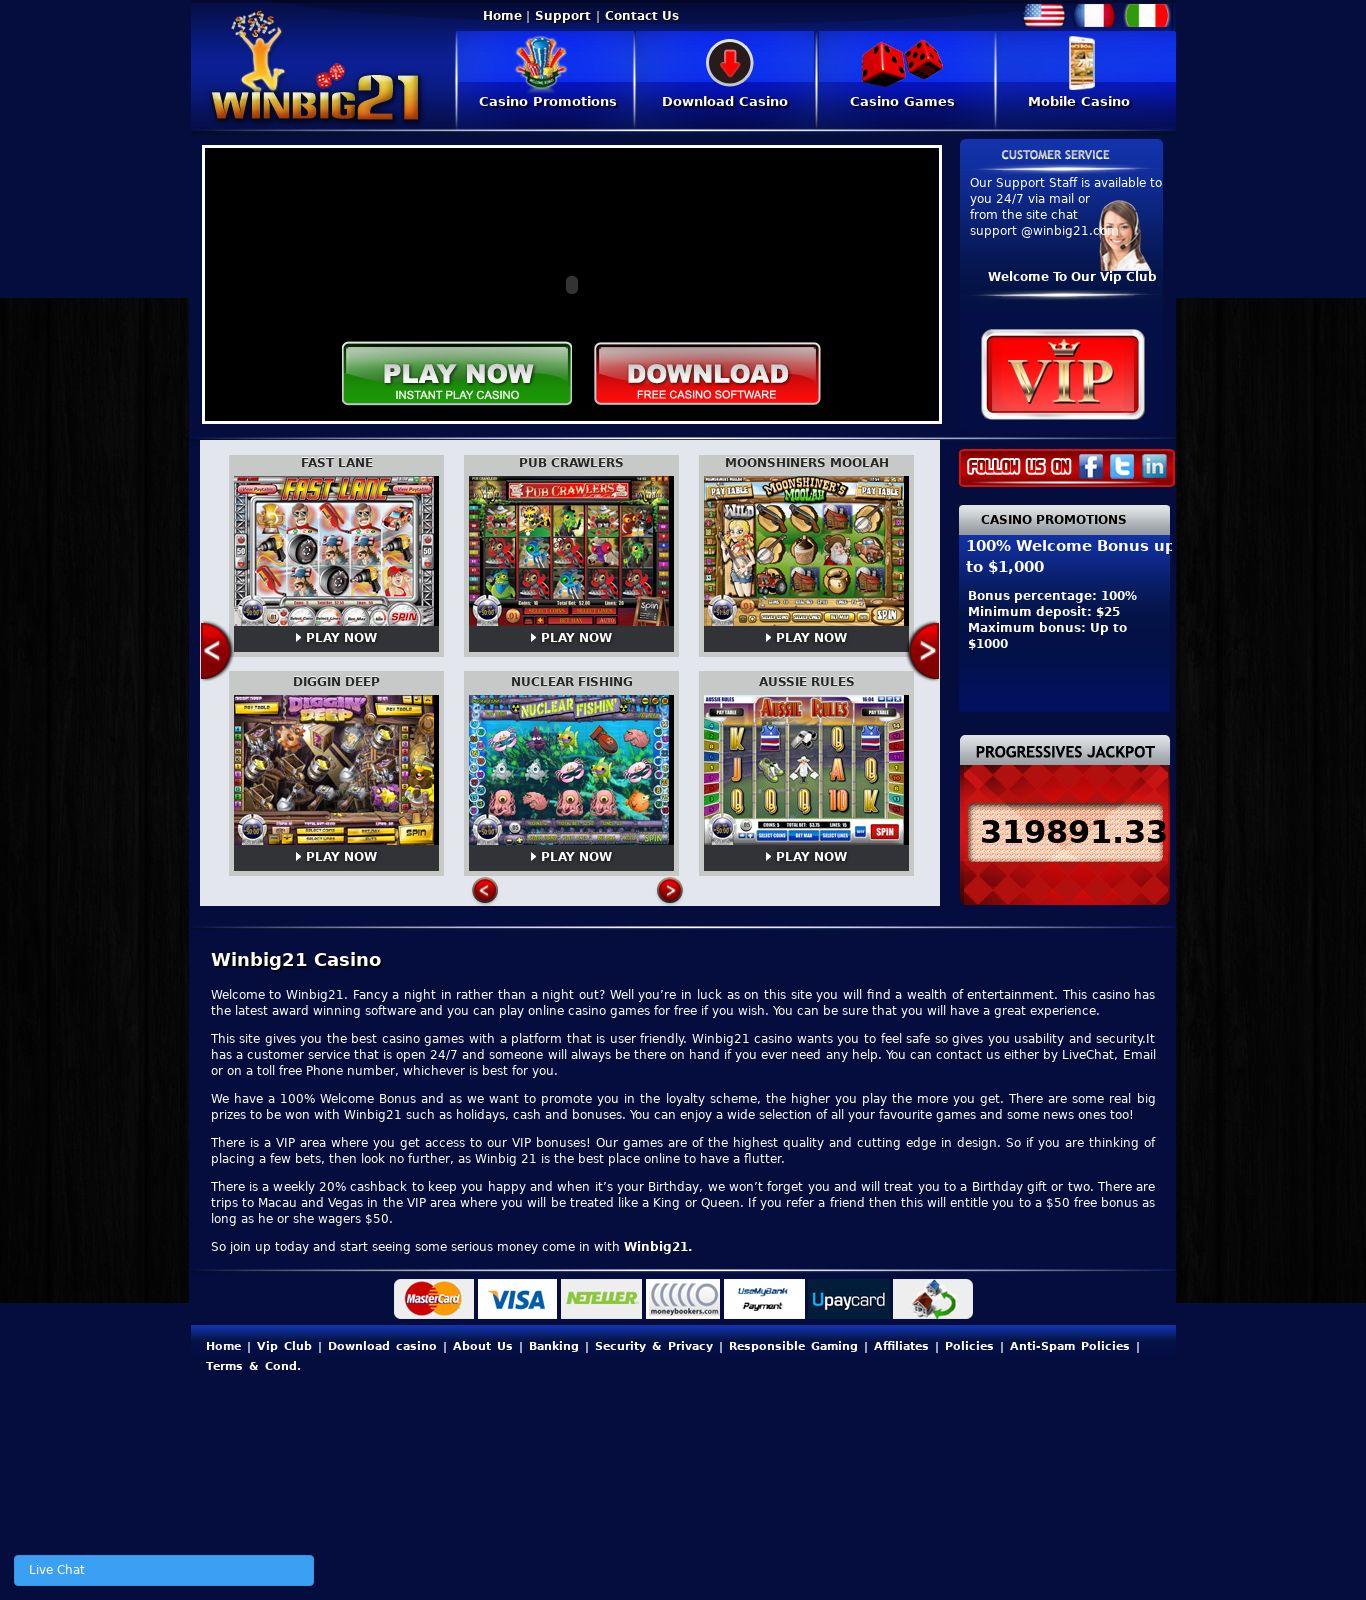 Winbig Casino